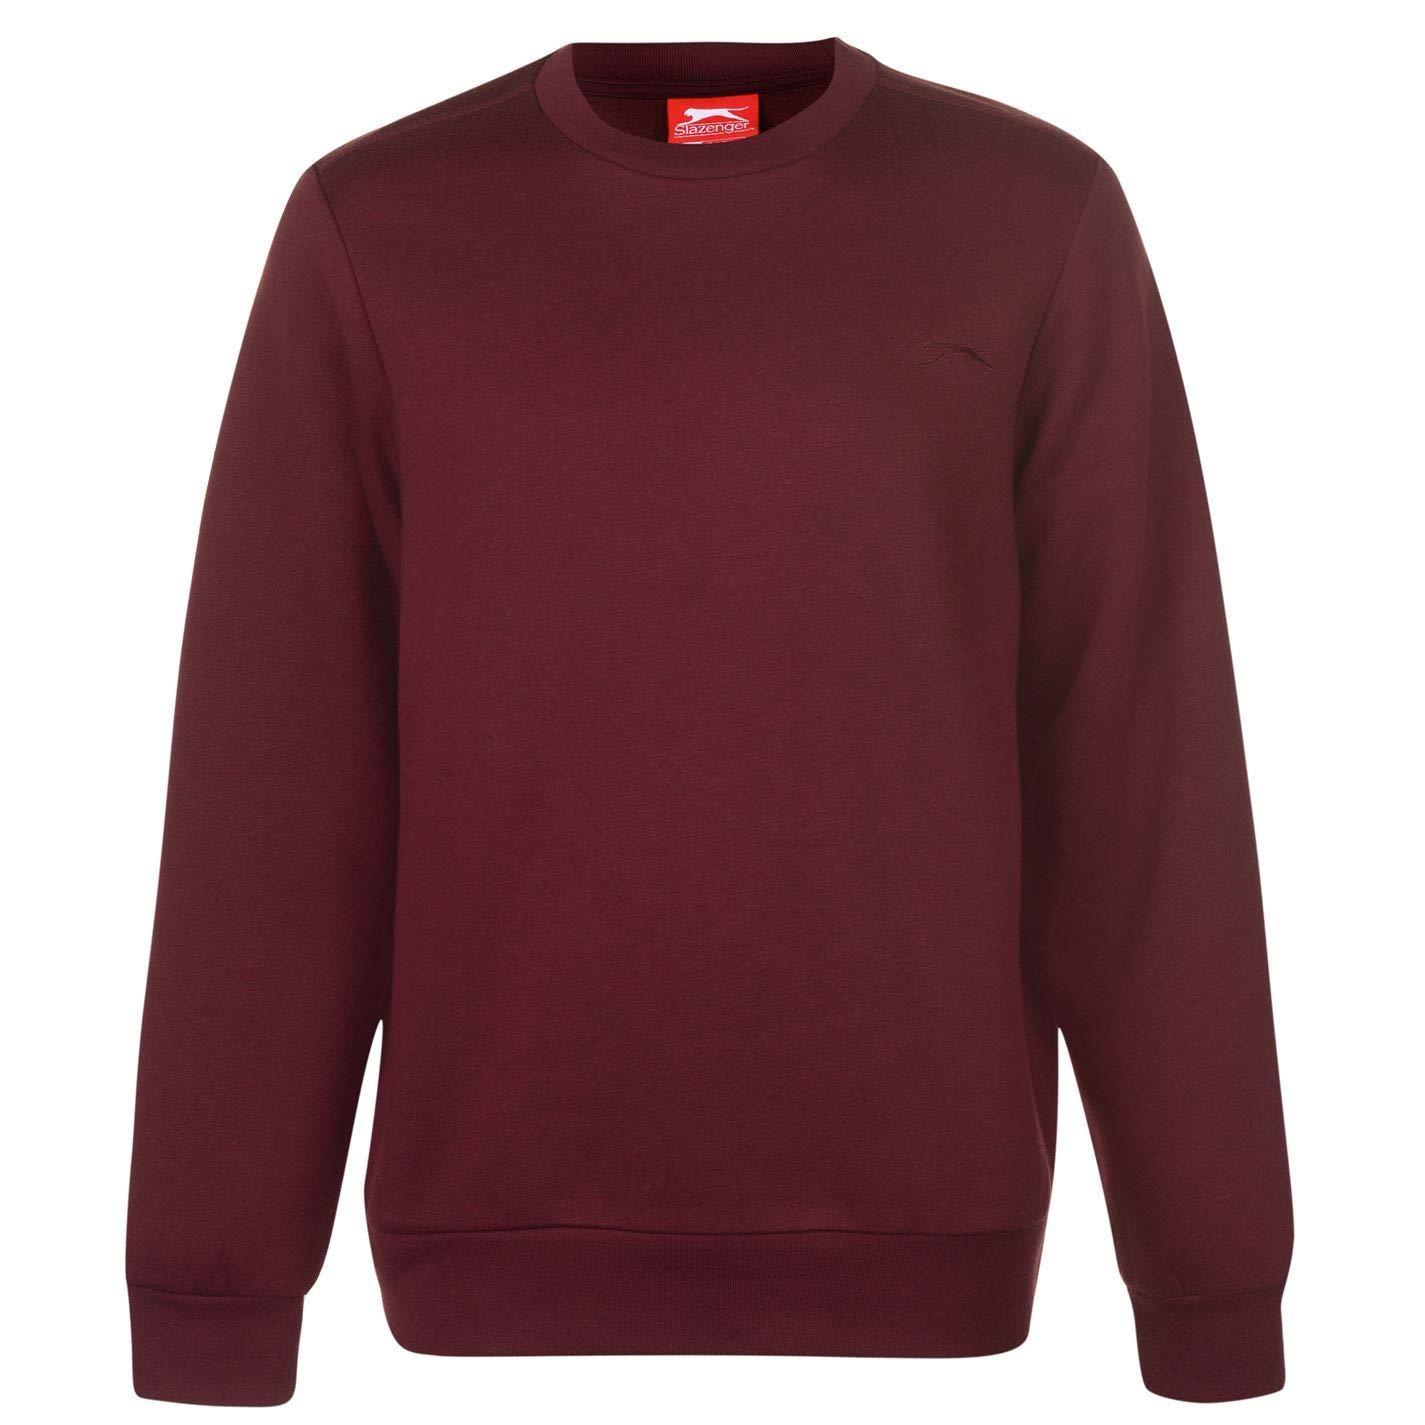 680b6468394 Slazenger SL Fleece Crew Sweatshirt Mens Sweater Top Jumper: Amazon.co.uk:  Clothing